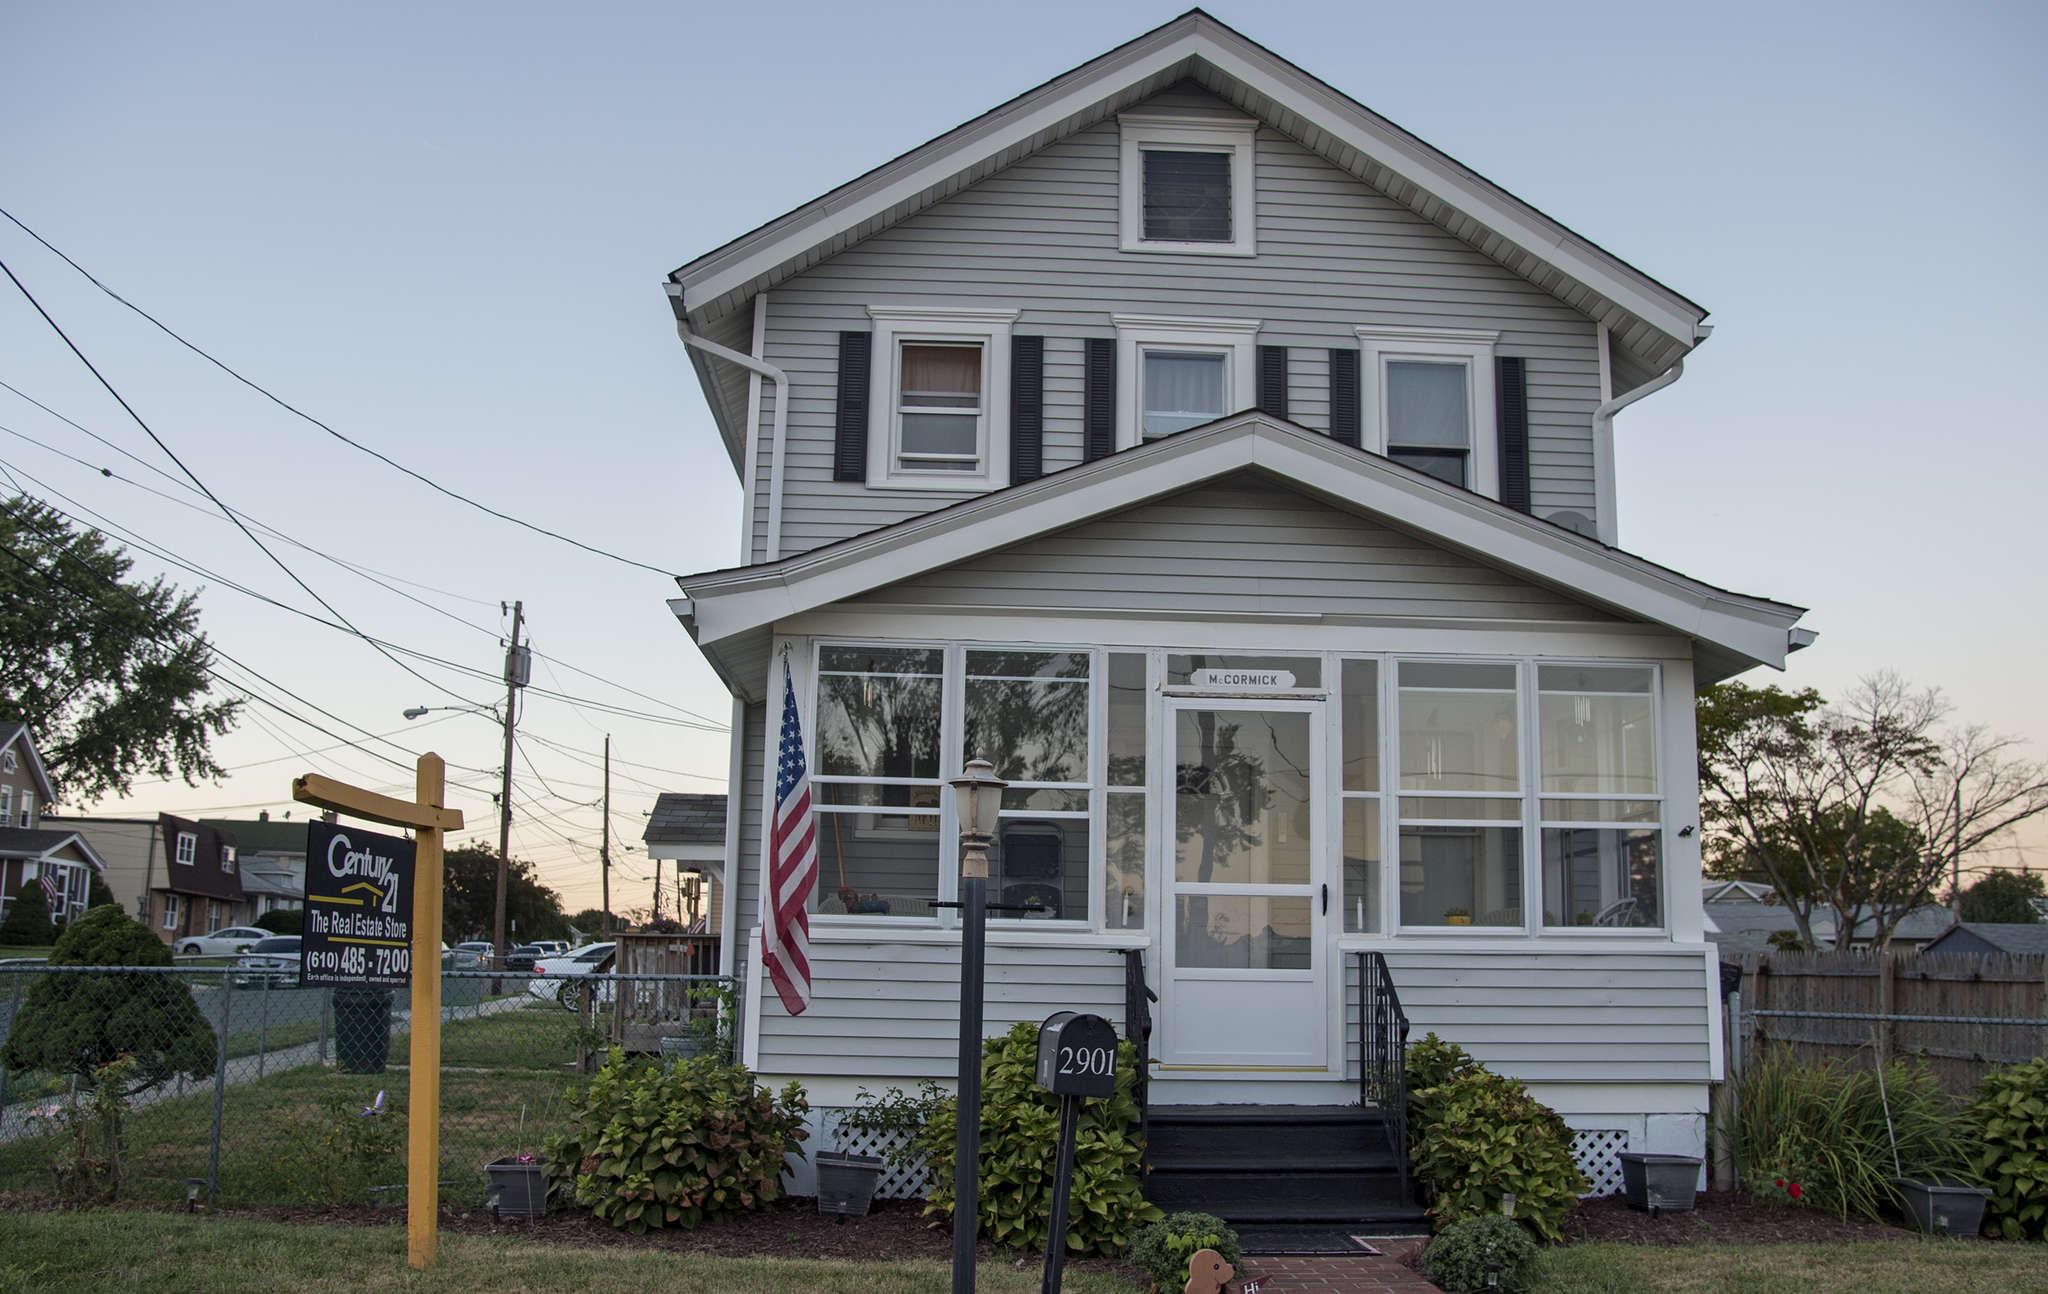 Parkside Borough, Delaware County where homes for sale include 2901 Arlington Avenue September 12, 2016.